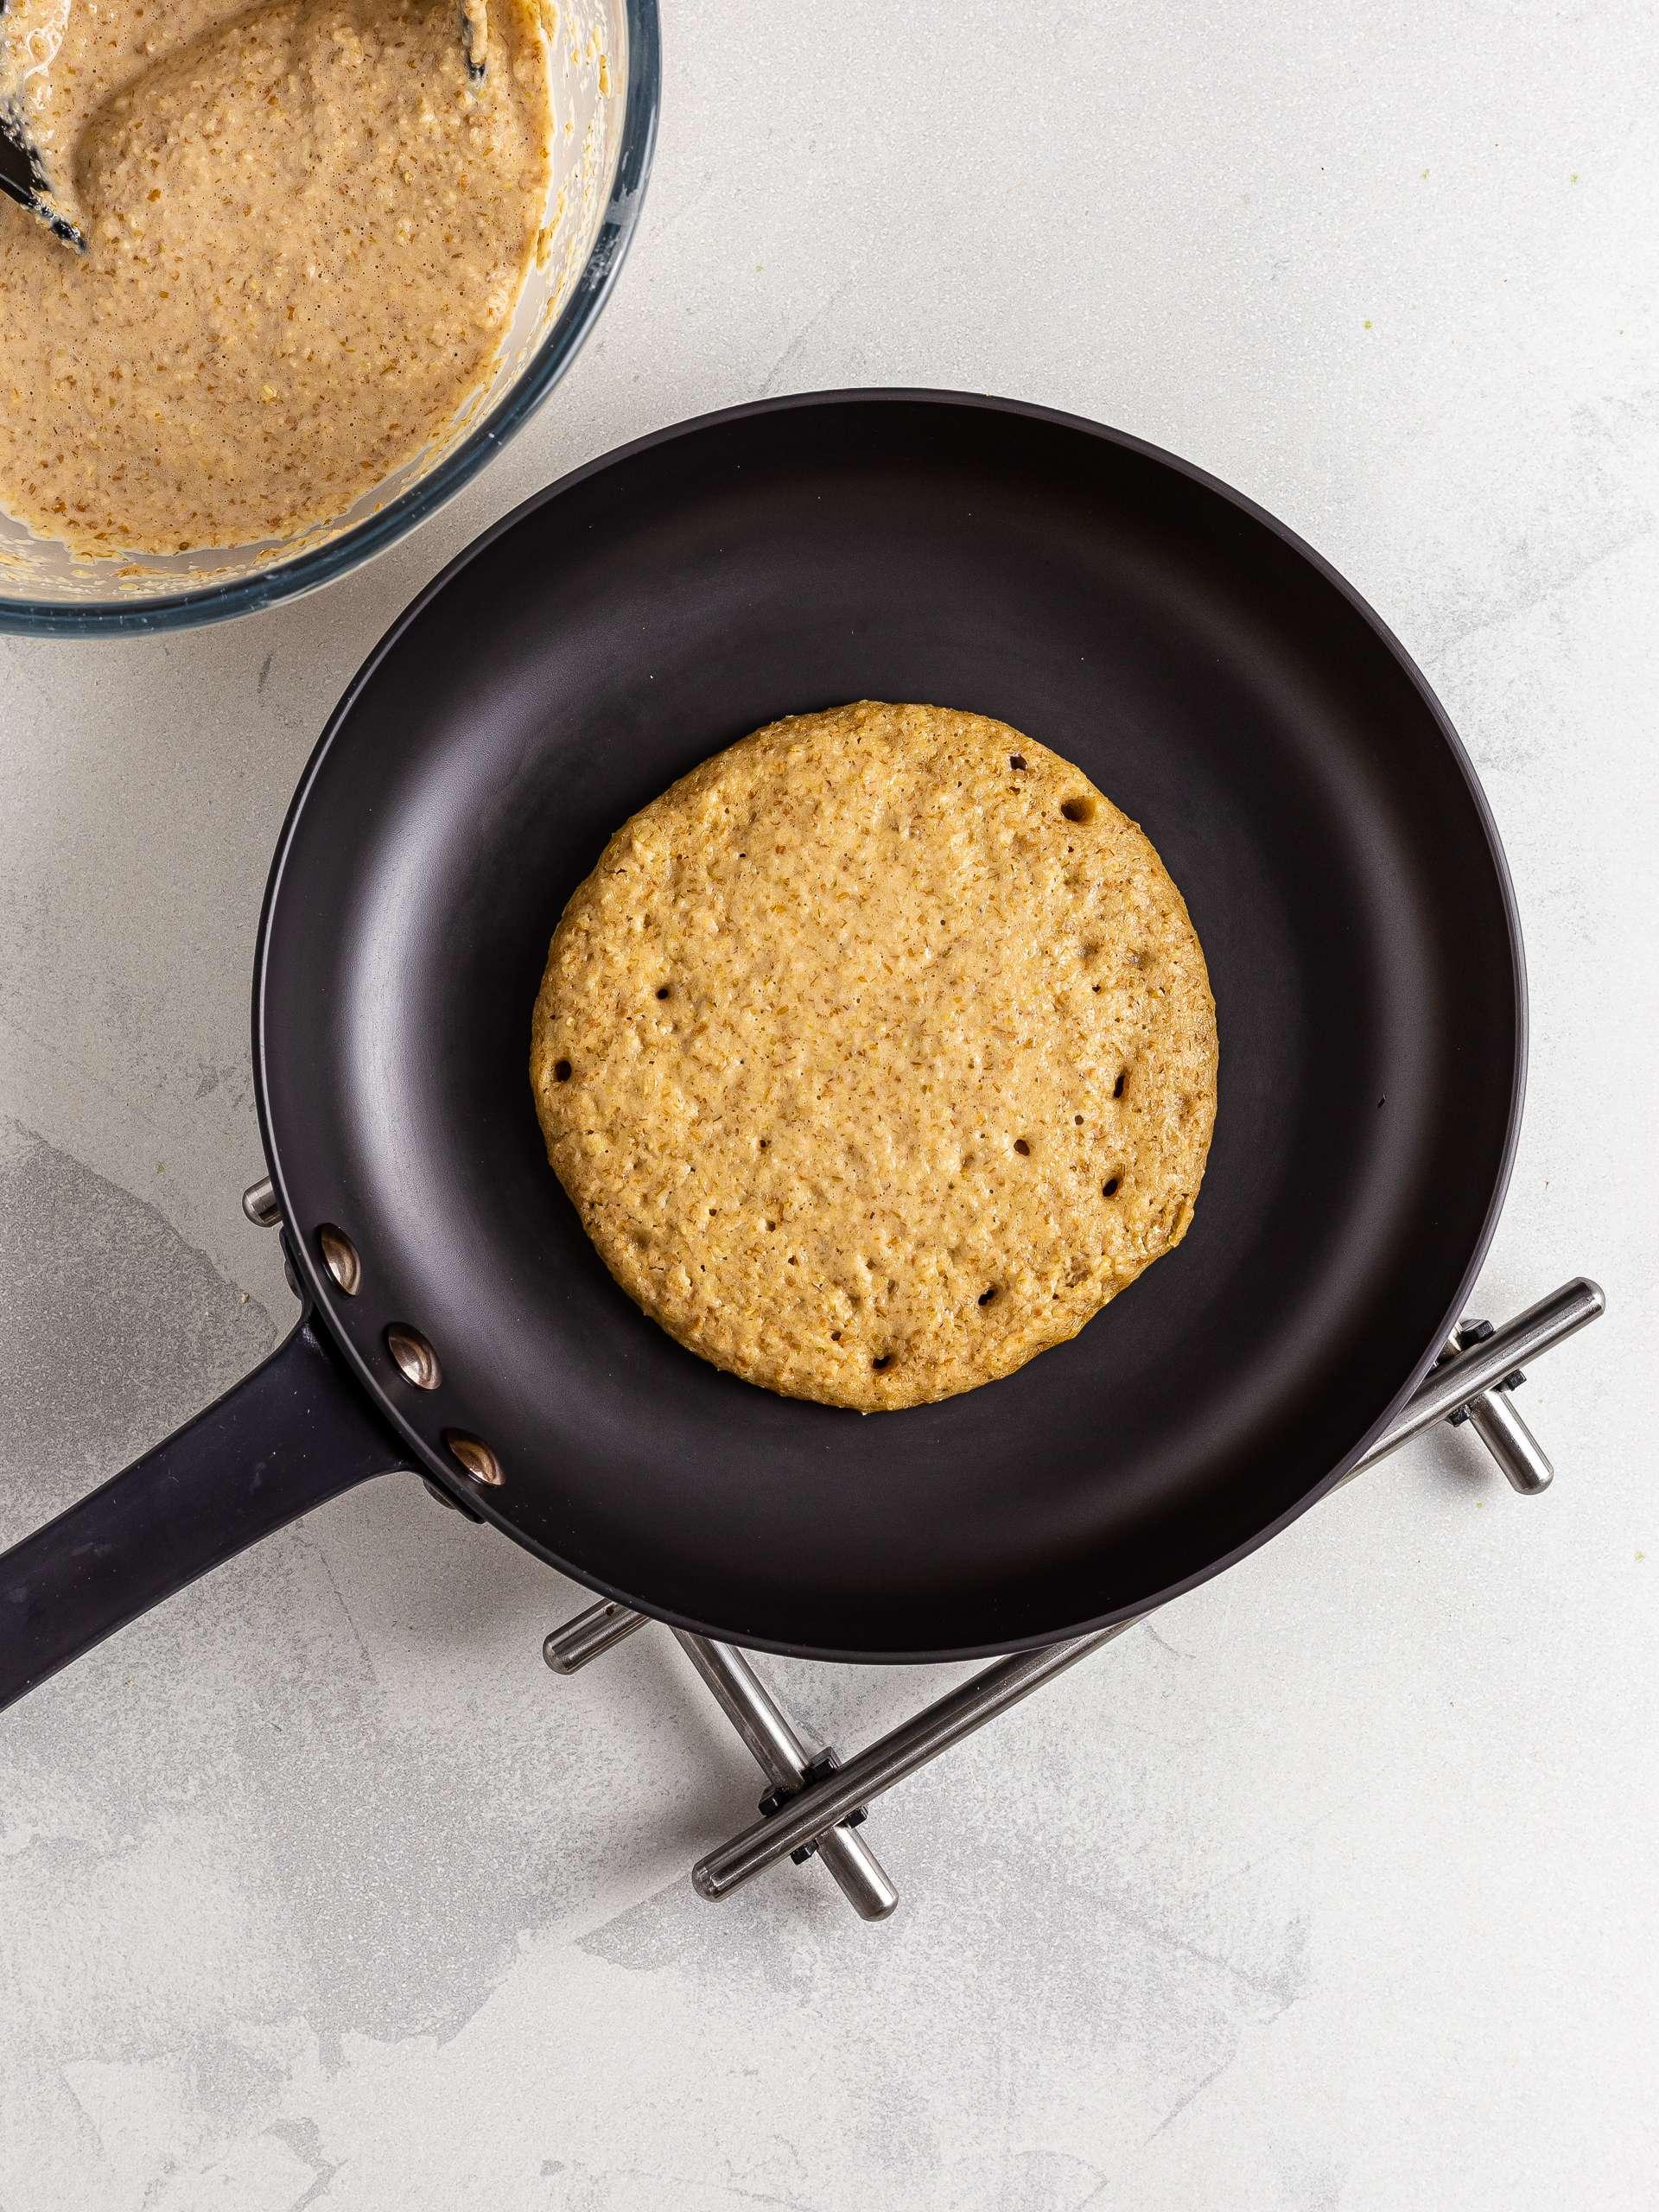 Lentil pancakes cooking in a skillet